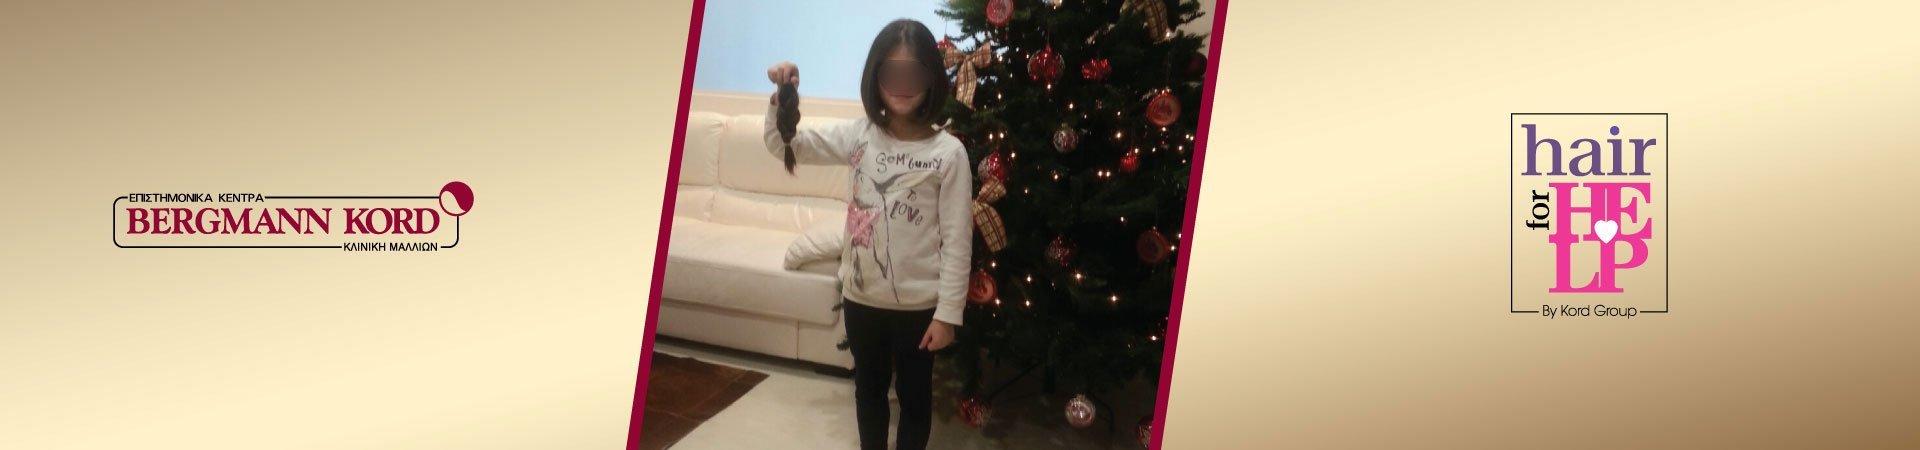 HAIR for HELP – Παιδικές Γιορτινές Προσφορές